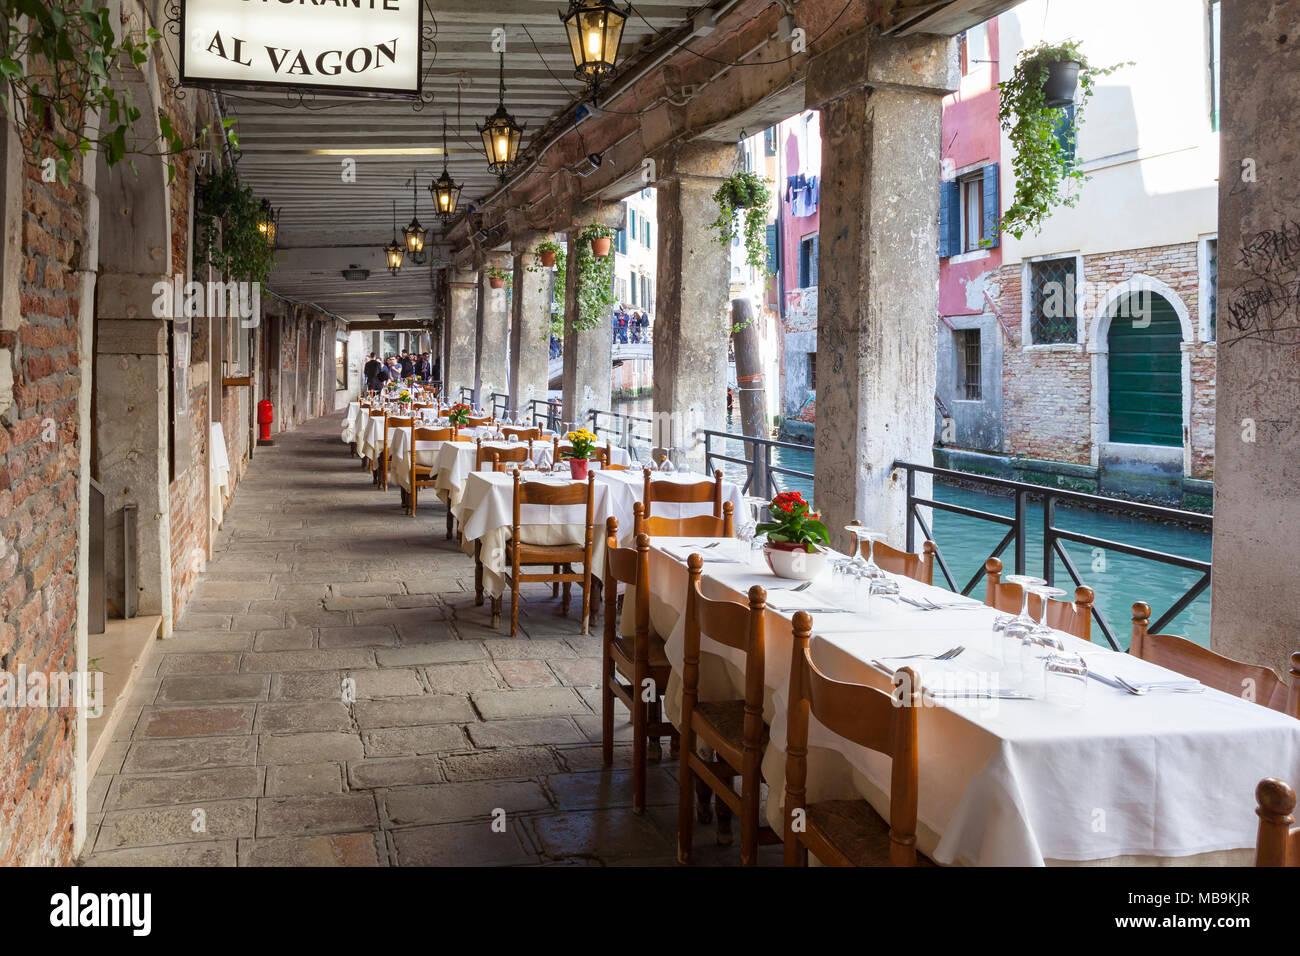 Tables under  sotoportego Magazen (undercover walkway) at Ristorante Al Vagon, Cannaregio, Venice, Veneto, Italy alongside Rio dei Santi Apostoli cana - Stock Image